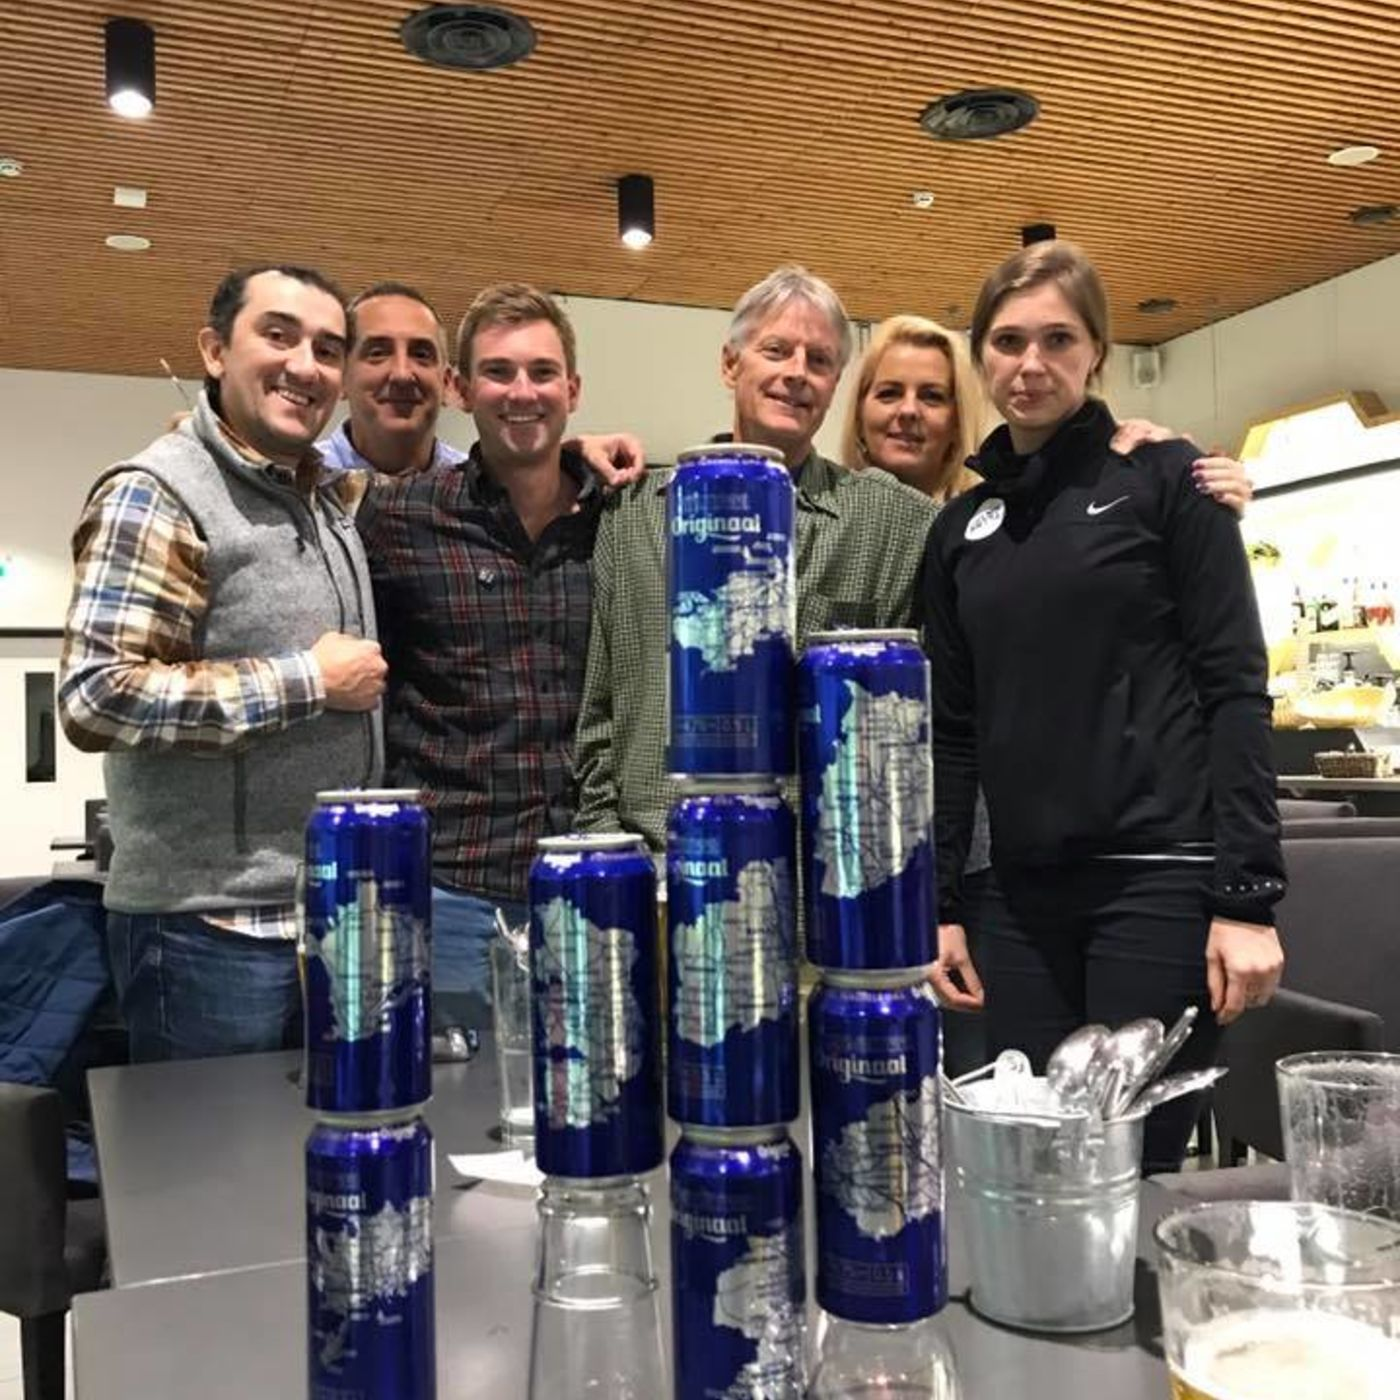 Ep. 27 - Tallinn Cup (Ordway, Smeed, Rivillas, Miller)